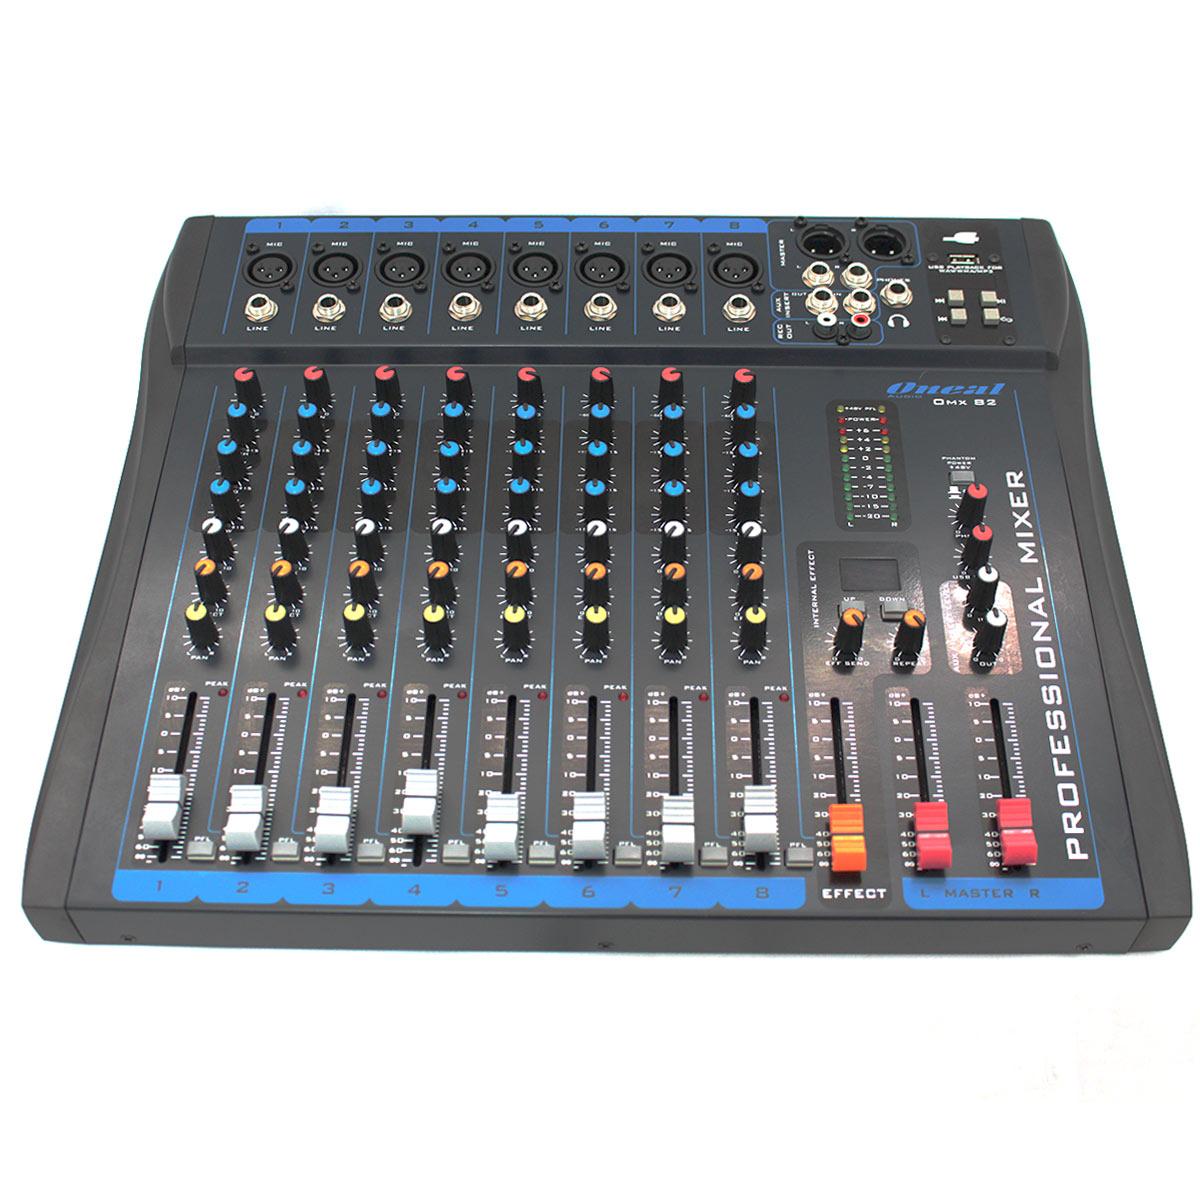 OMX82 - Mesa de Som / Mixer 8 Canais c/ USB OMX 82 - Oneal